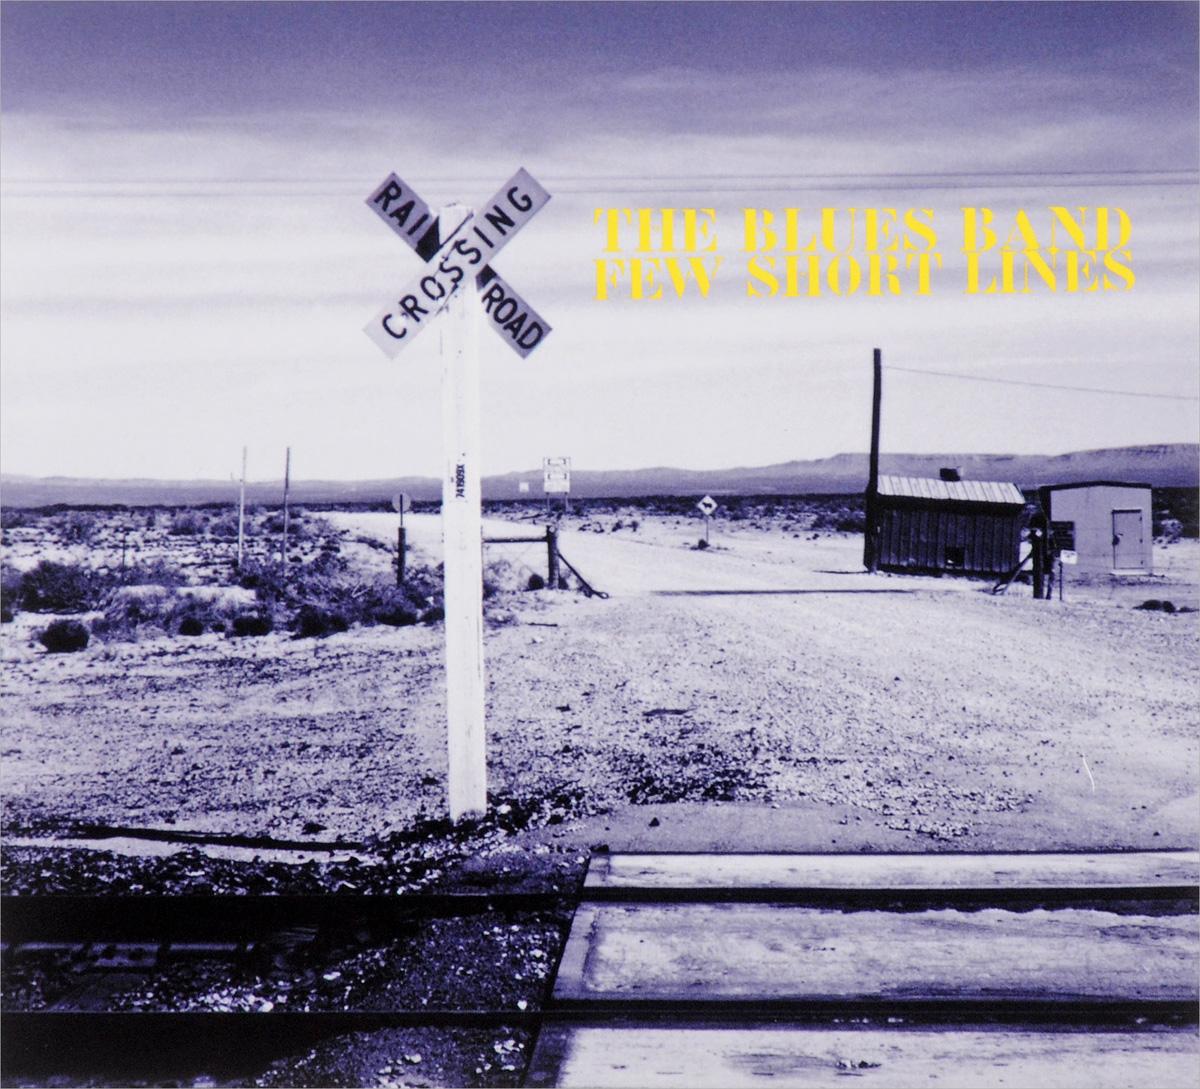 Blues Band,Майк Санчес,Линда Льюис,Джонни Саузсайд,Эл Купер,Мэгги Белл,Пит Вингфилд Blues Band. Few Short Lines blues band the blues band wire less